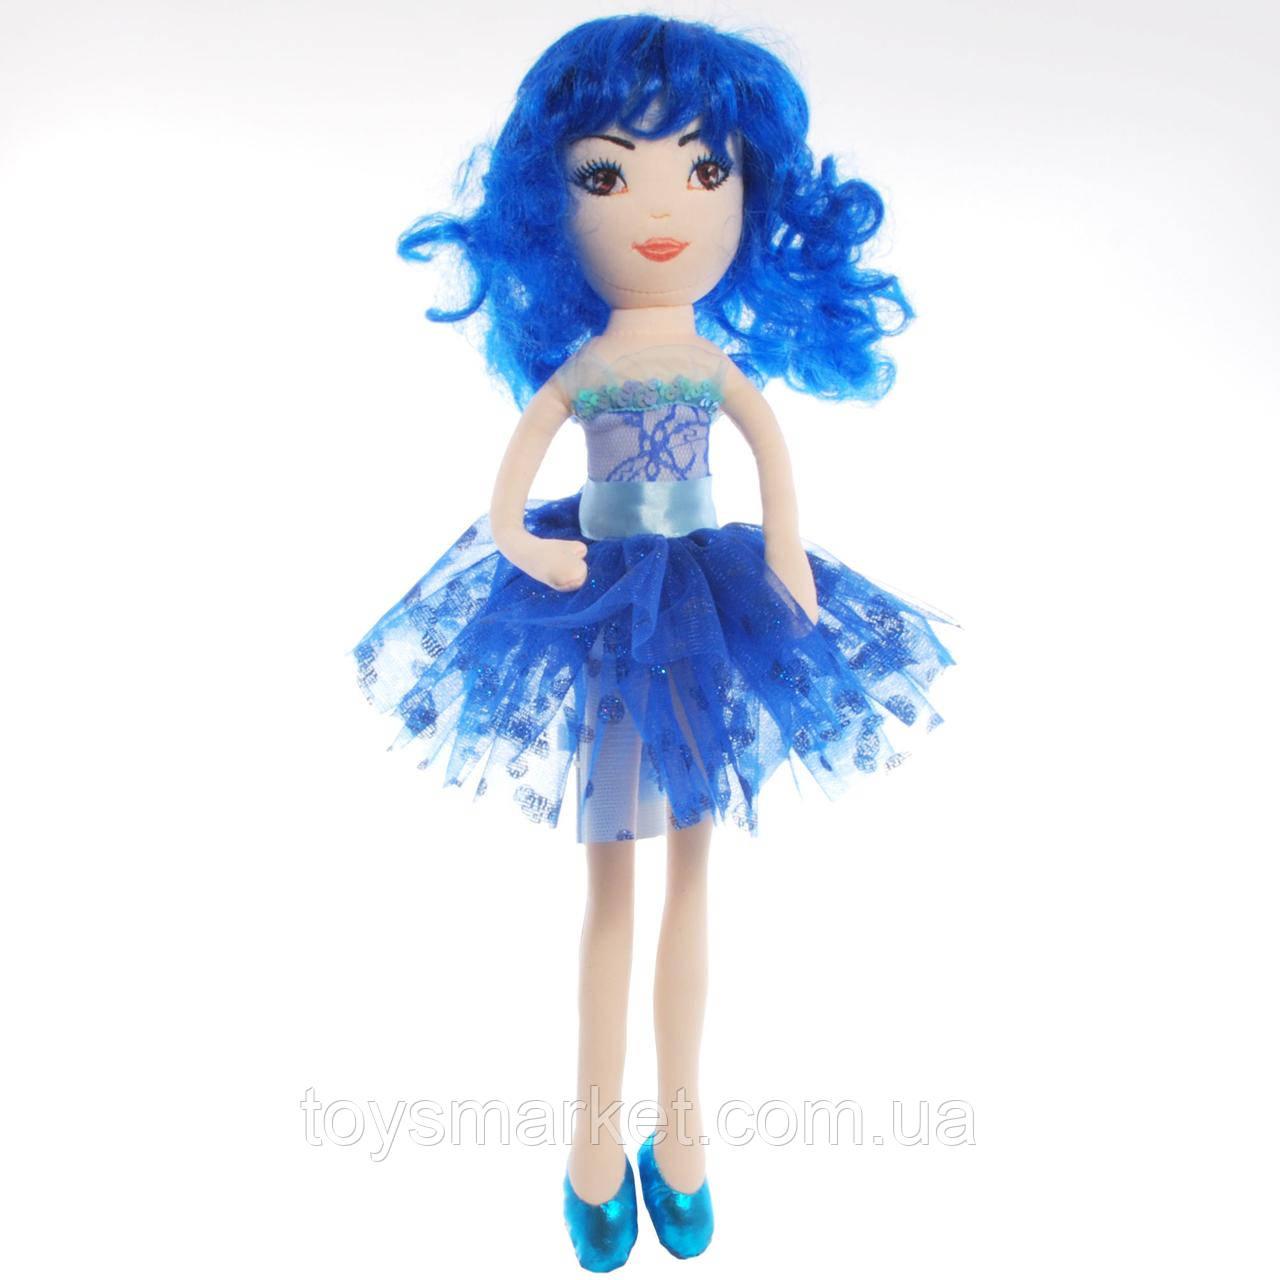 Мягкая игрушка кукла, 48 см.